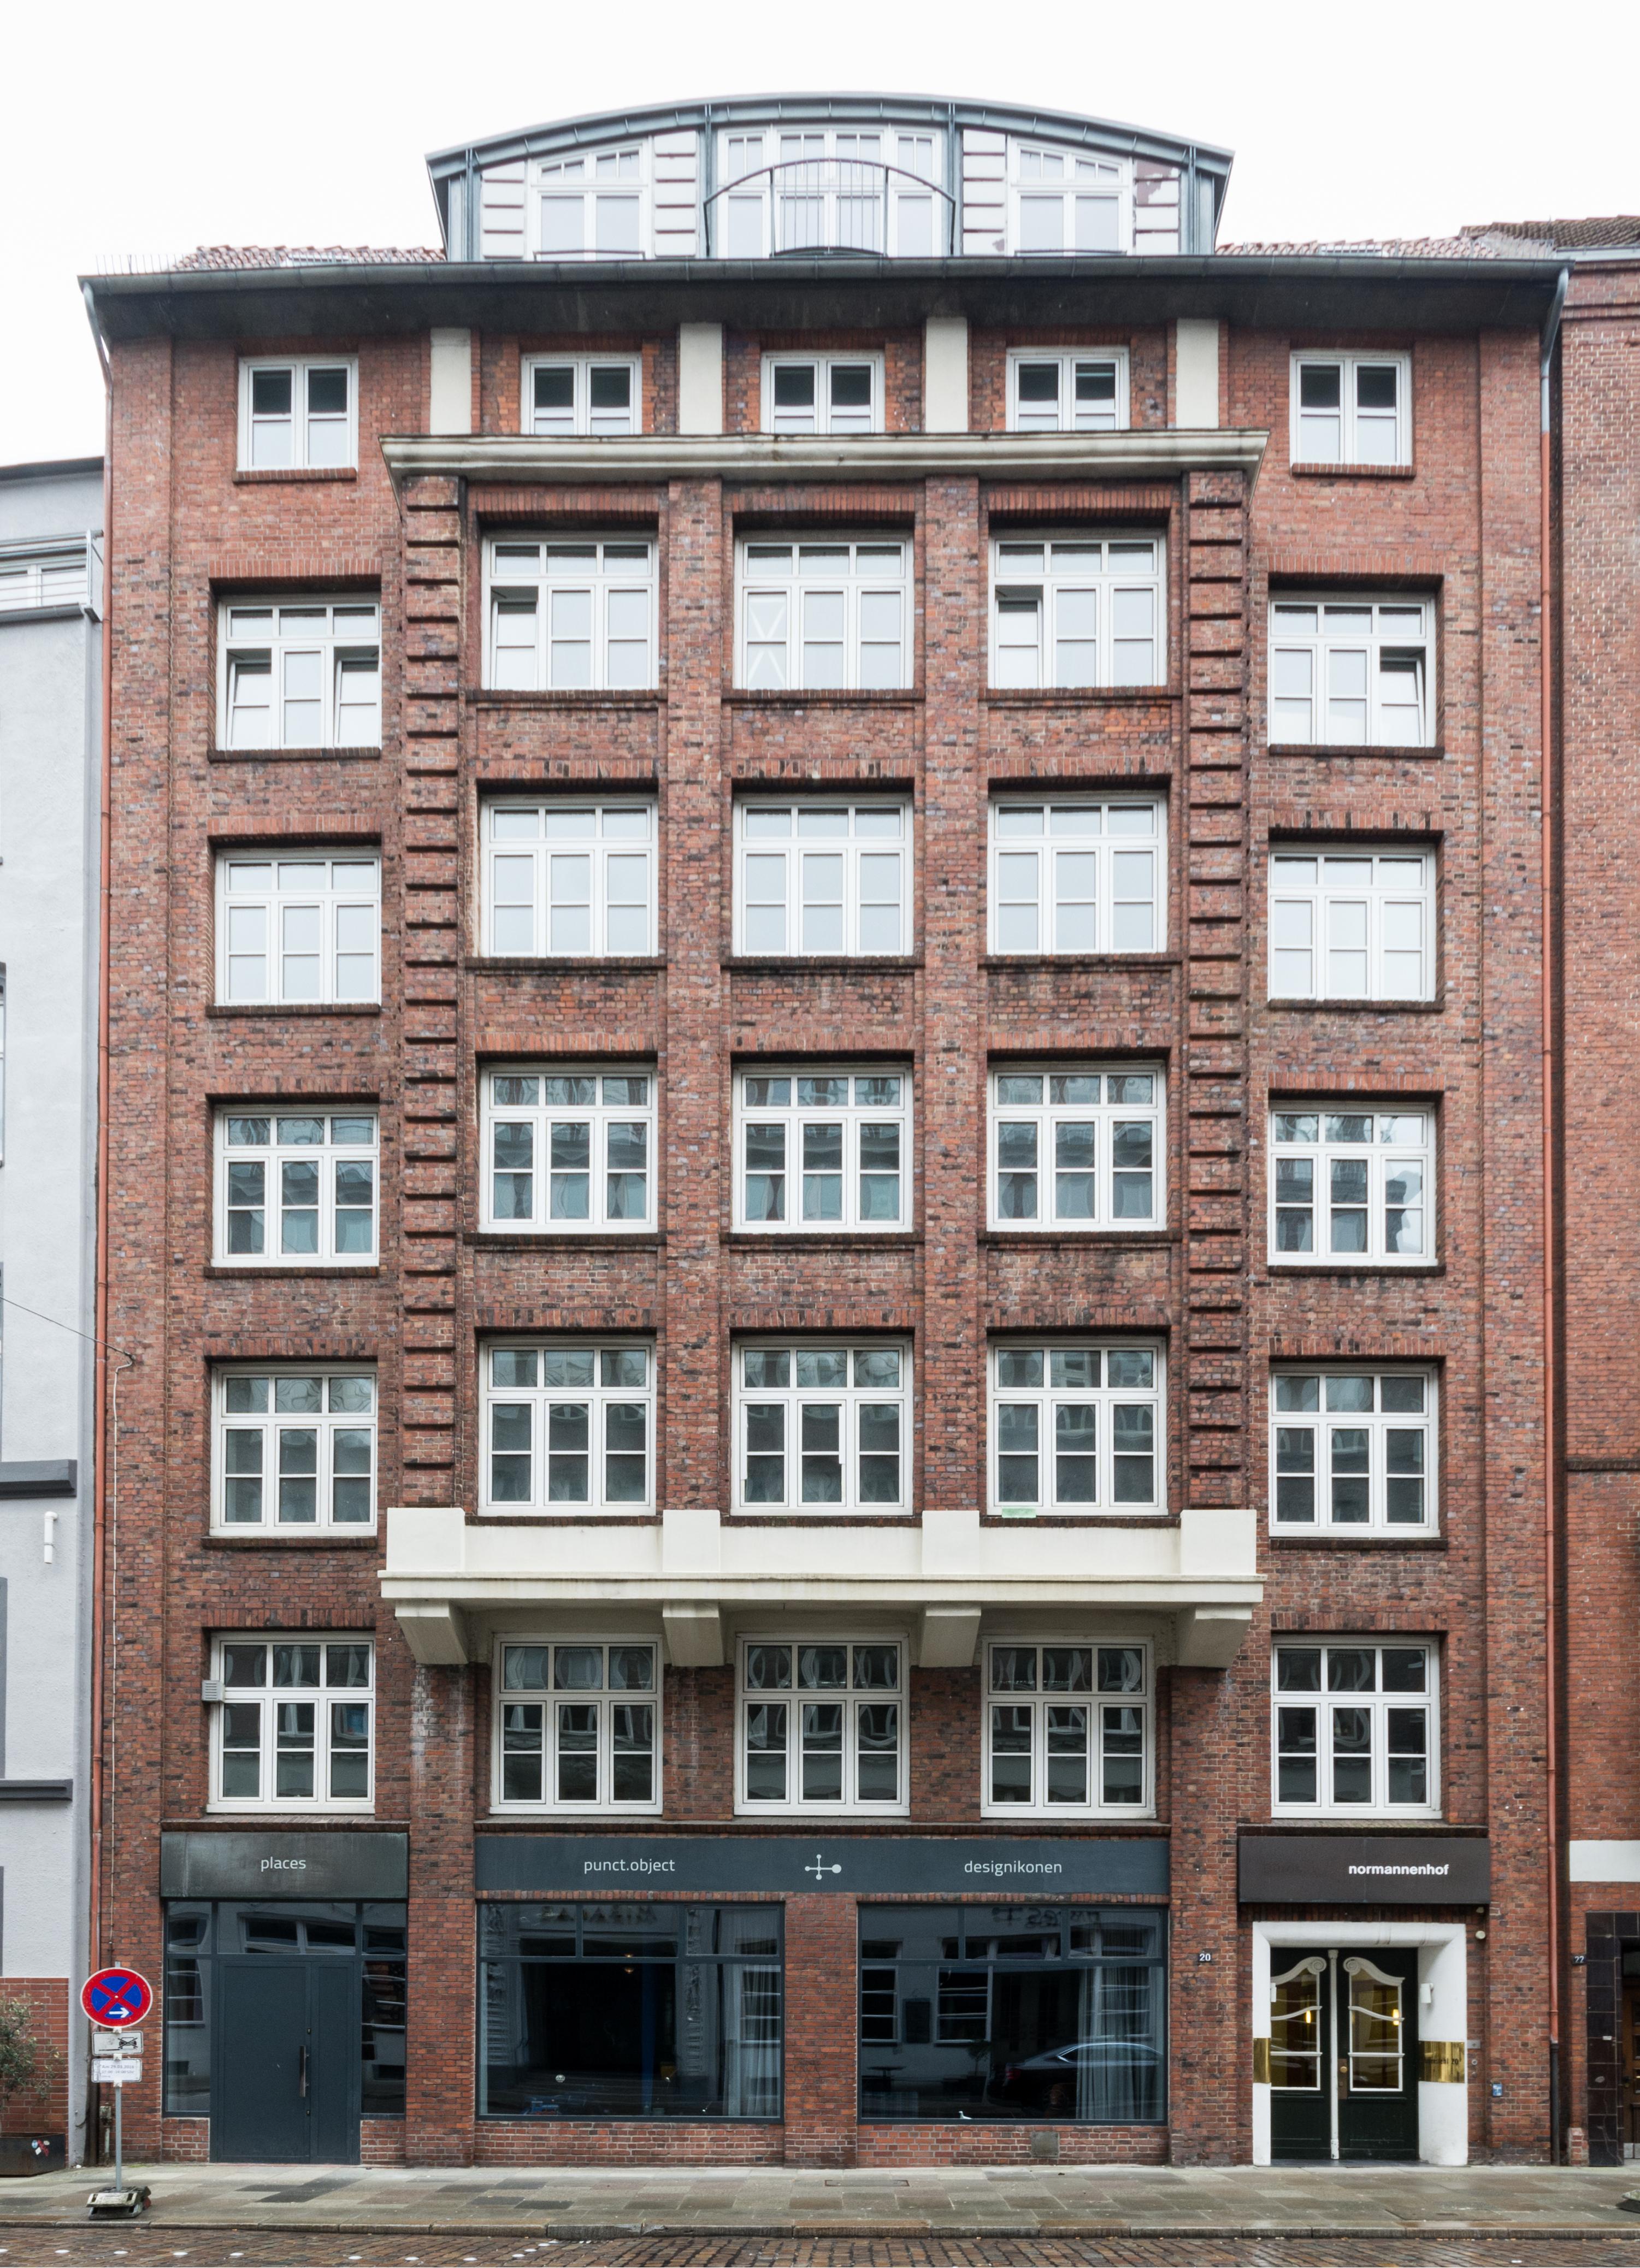 Punct Object Hamburg file:schopenstehl 20 (hamburg-altstadt).12264.ajb - wikimedia